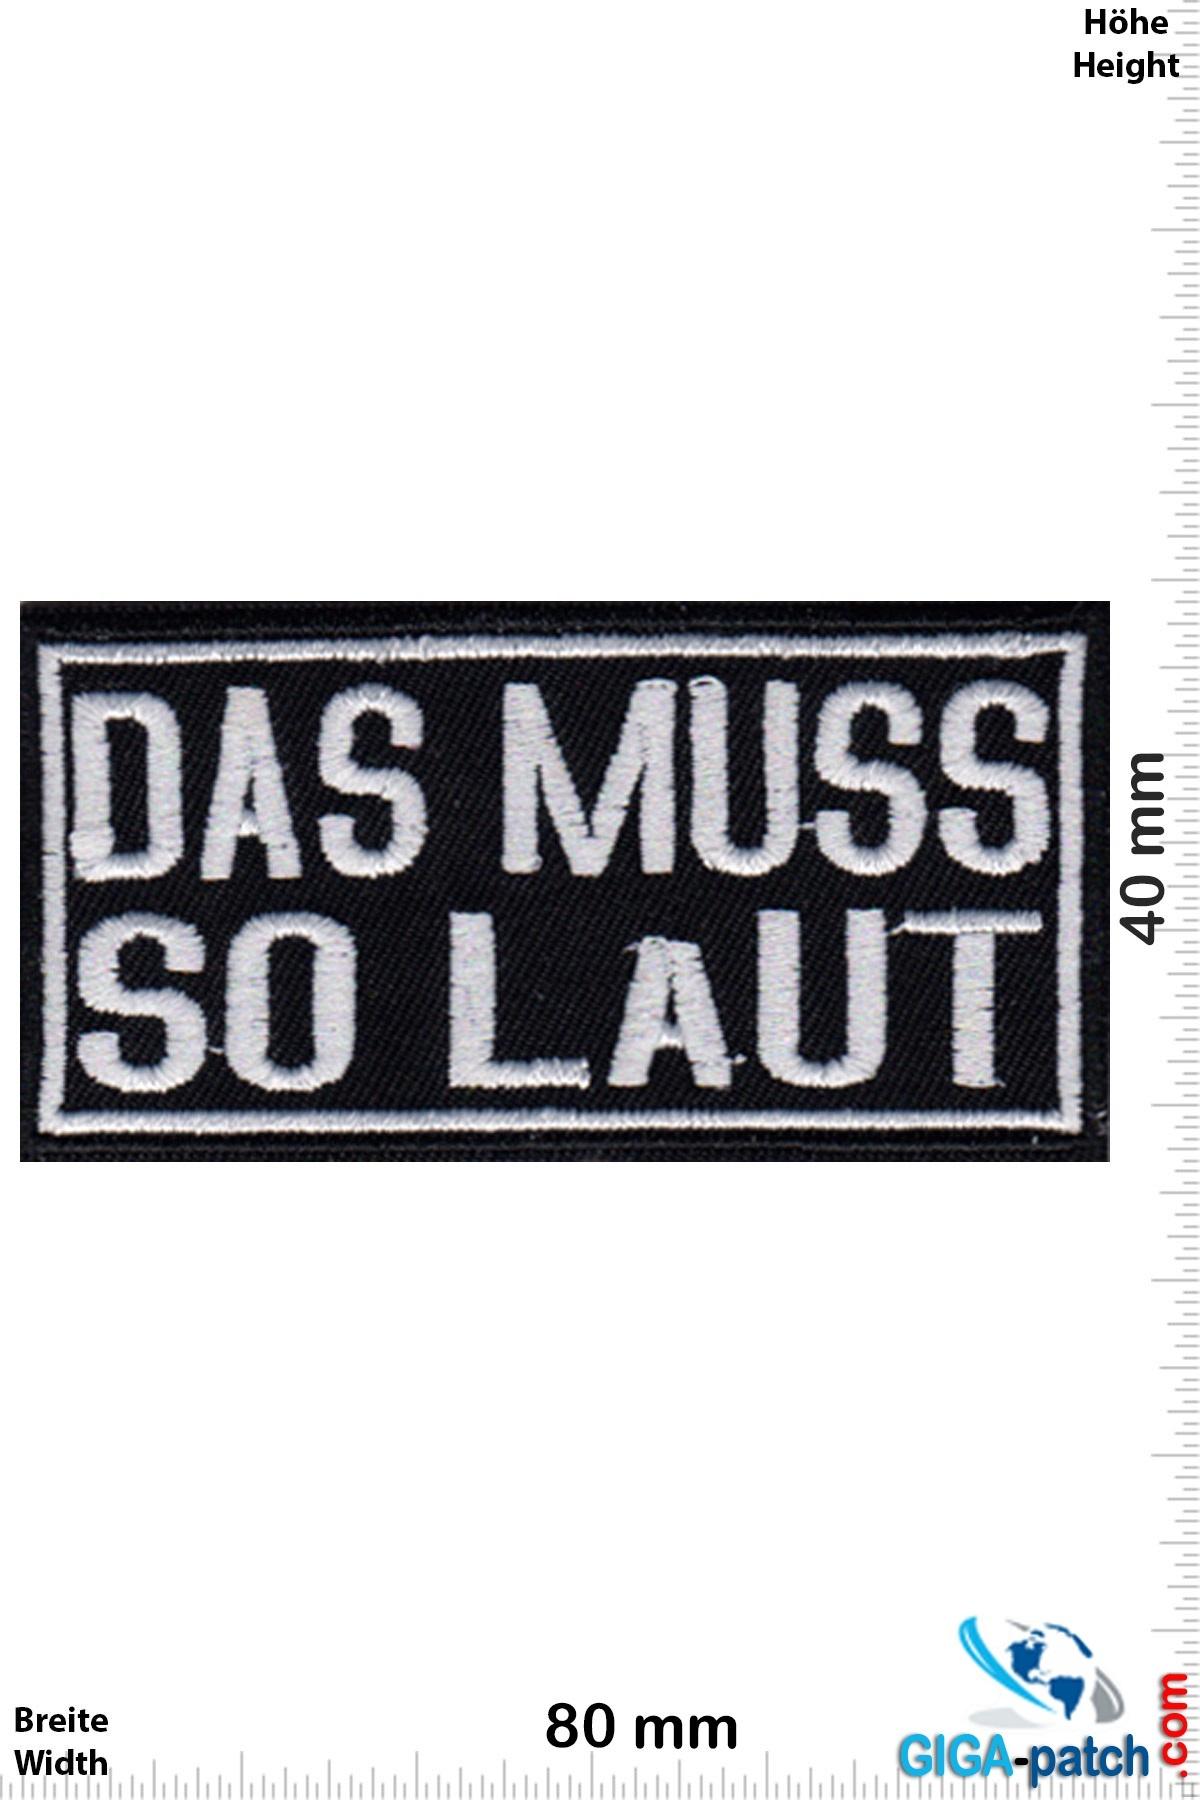 Sprüche, Claims DAS MUSS SO LAUT